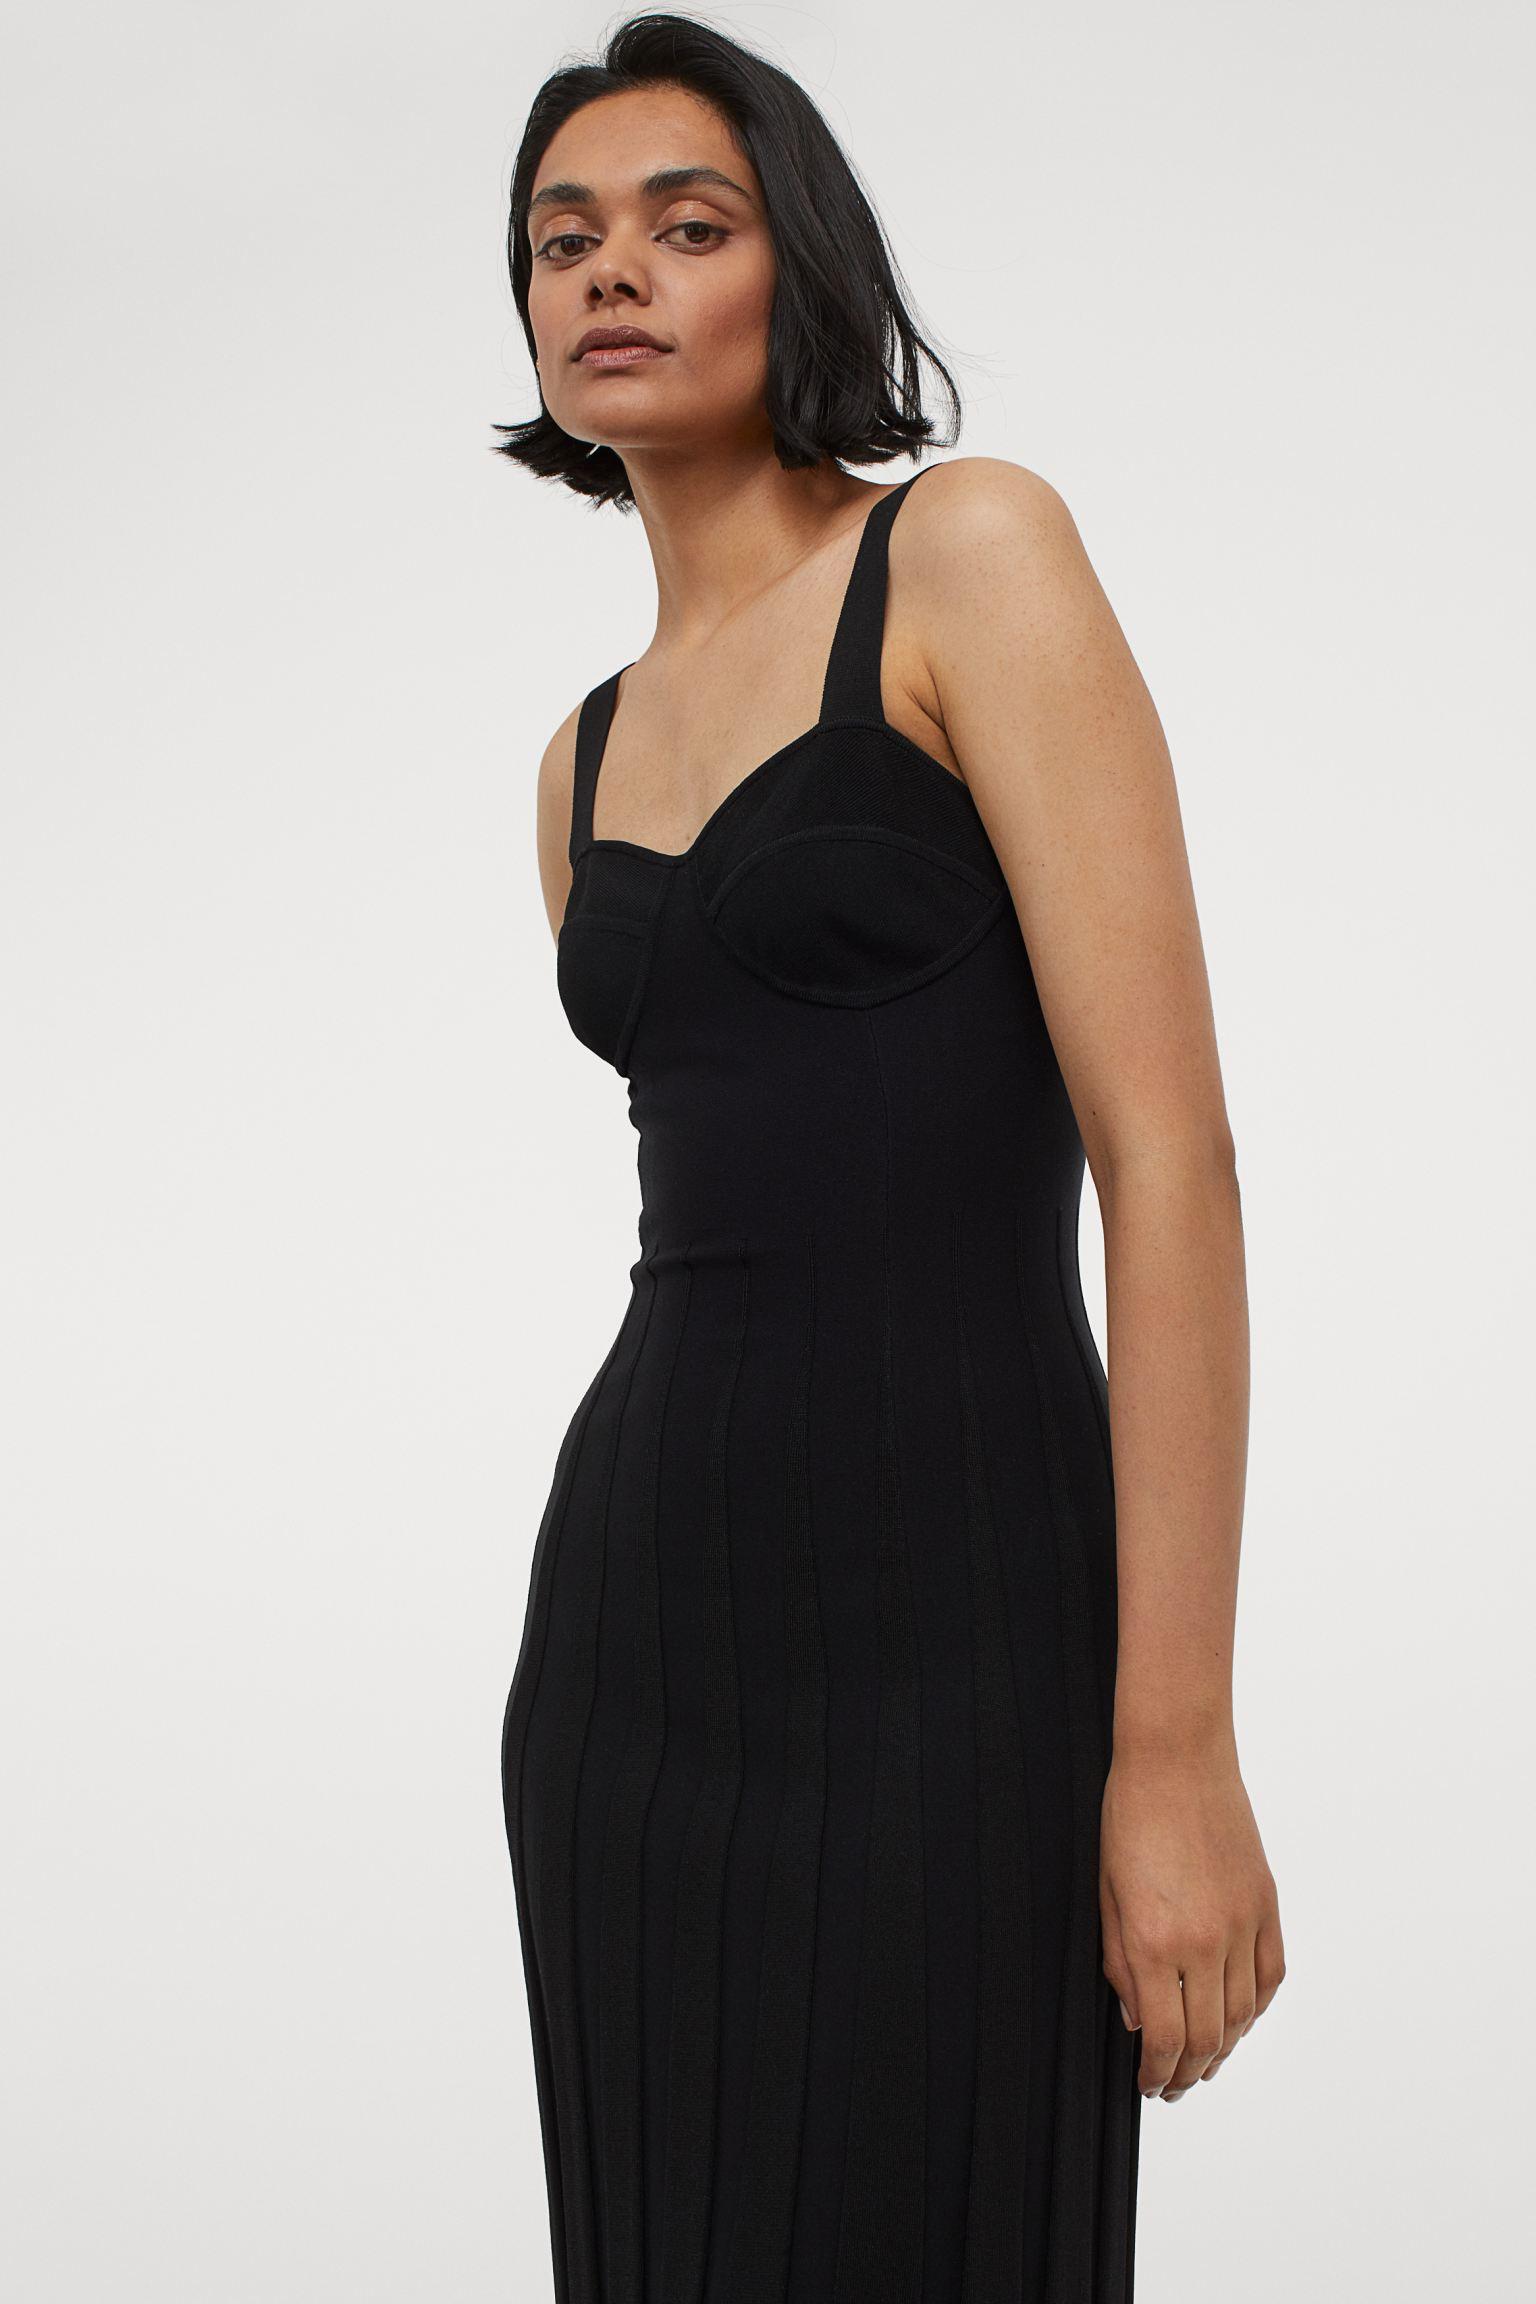 Vestido de punto fino negro muy ajustado